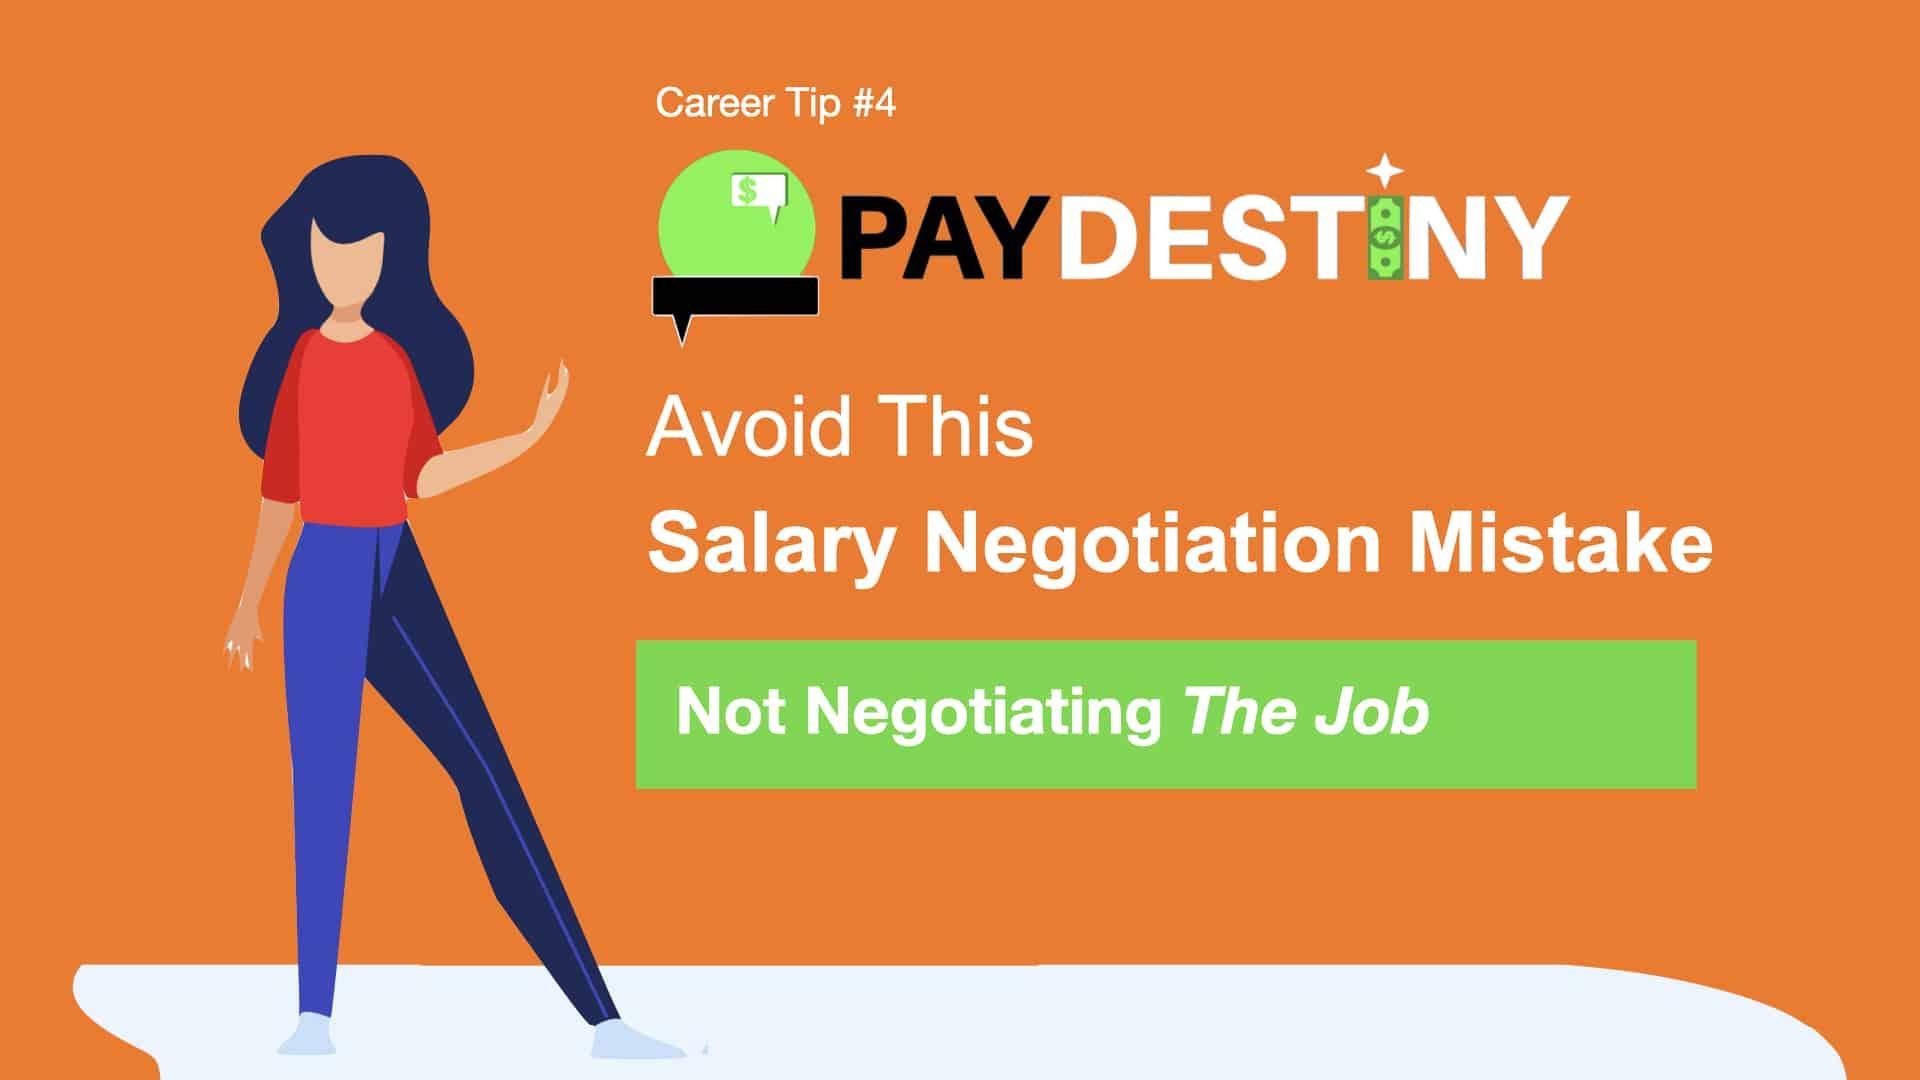 Salary Negotiation Mistake (Not negotiating the job)